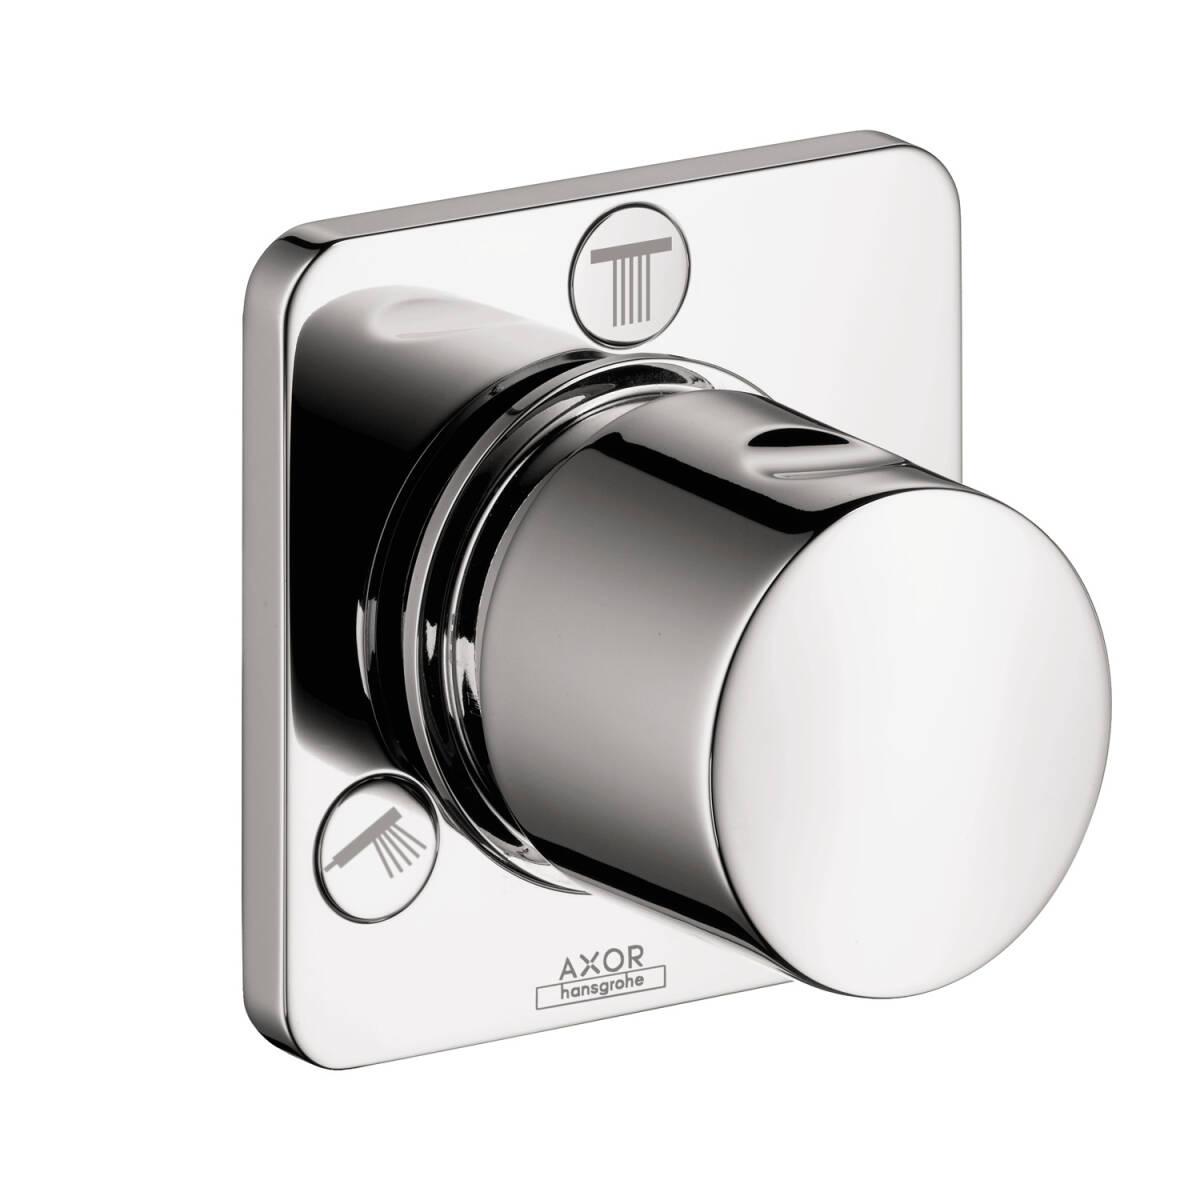 Shut-off/ diverter valve Trio/ Quattro for concealed installation, Chrome, 34934001